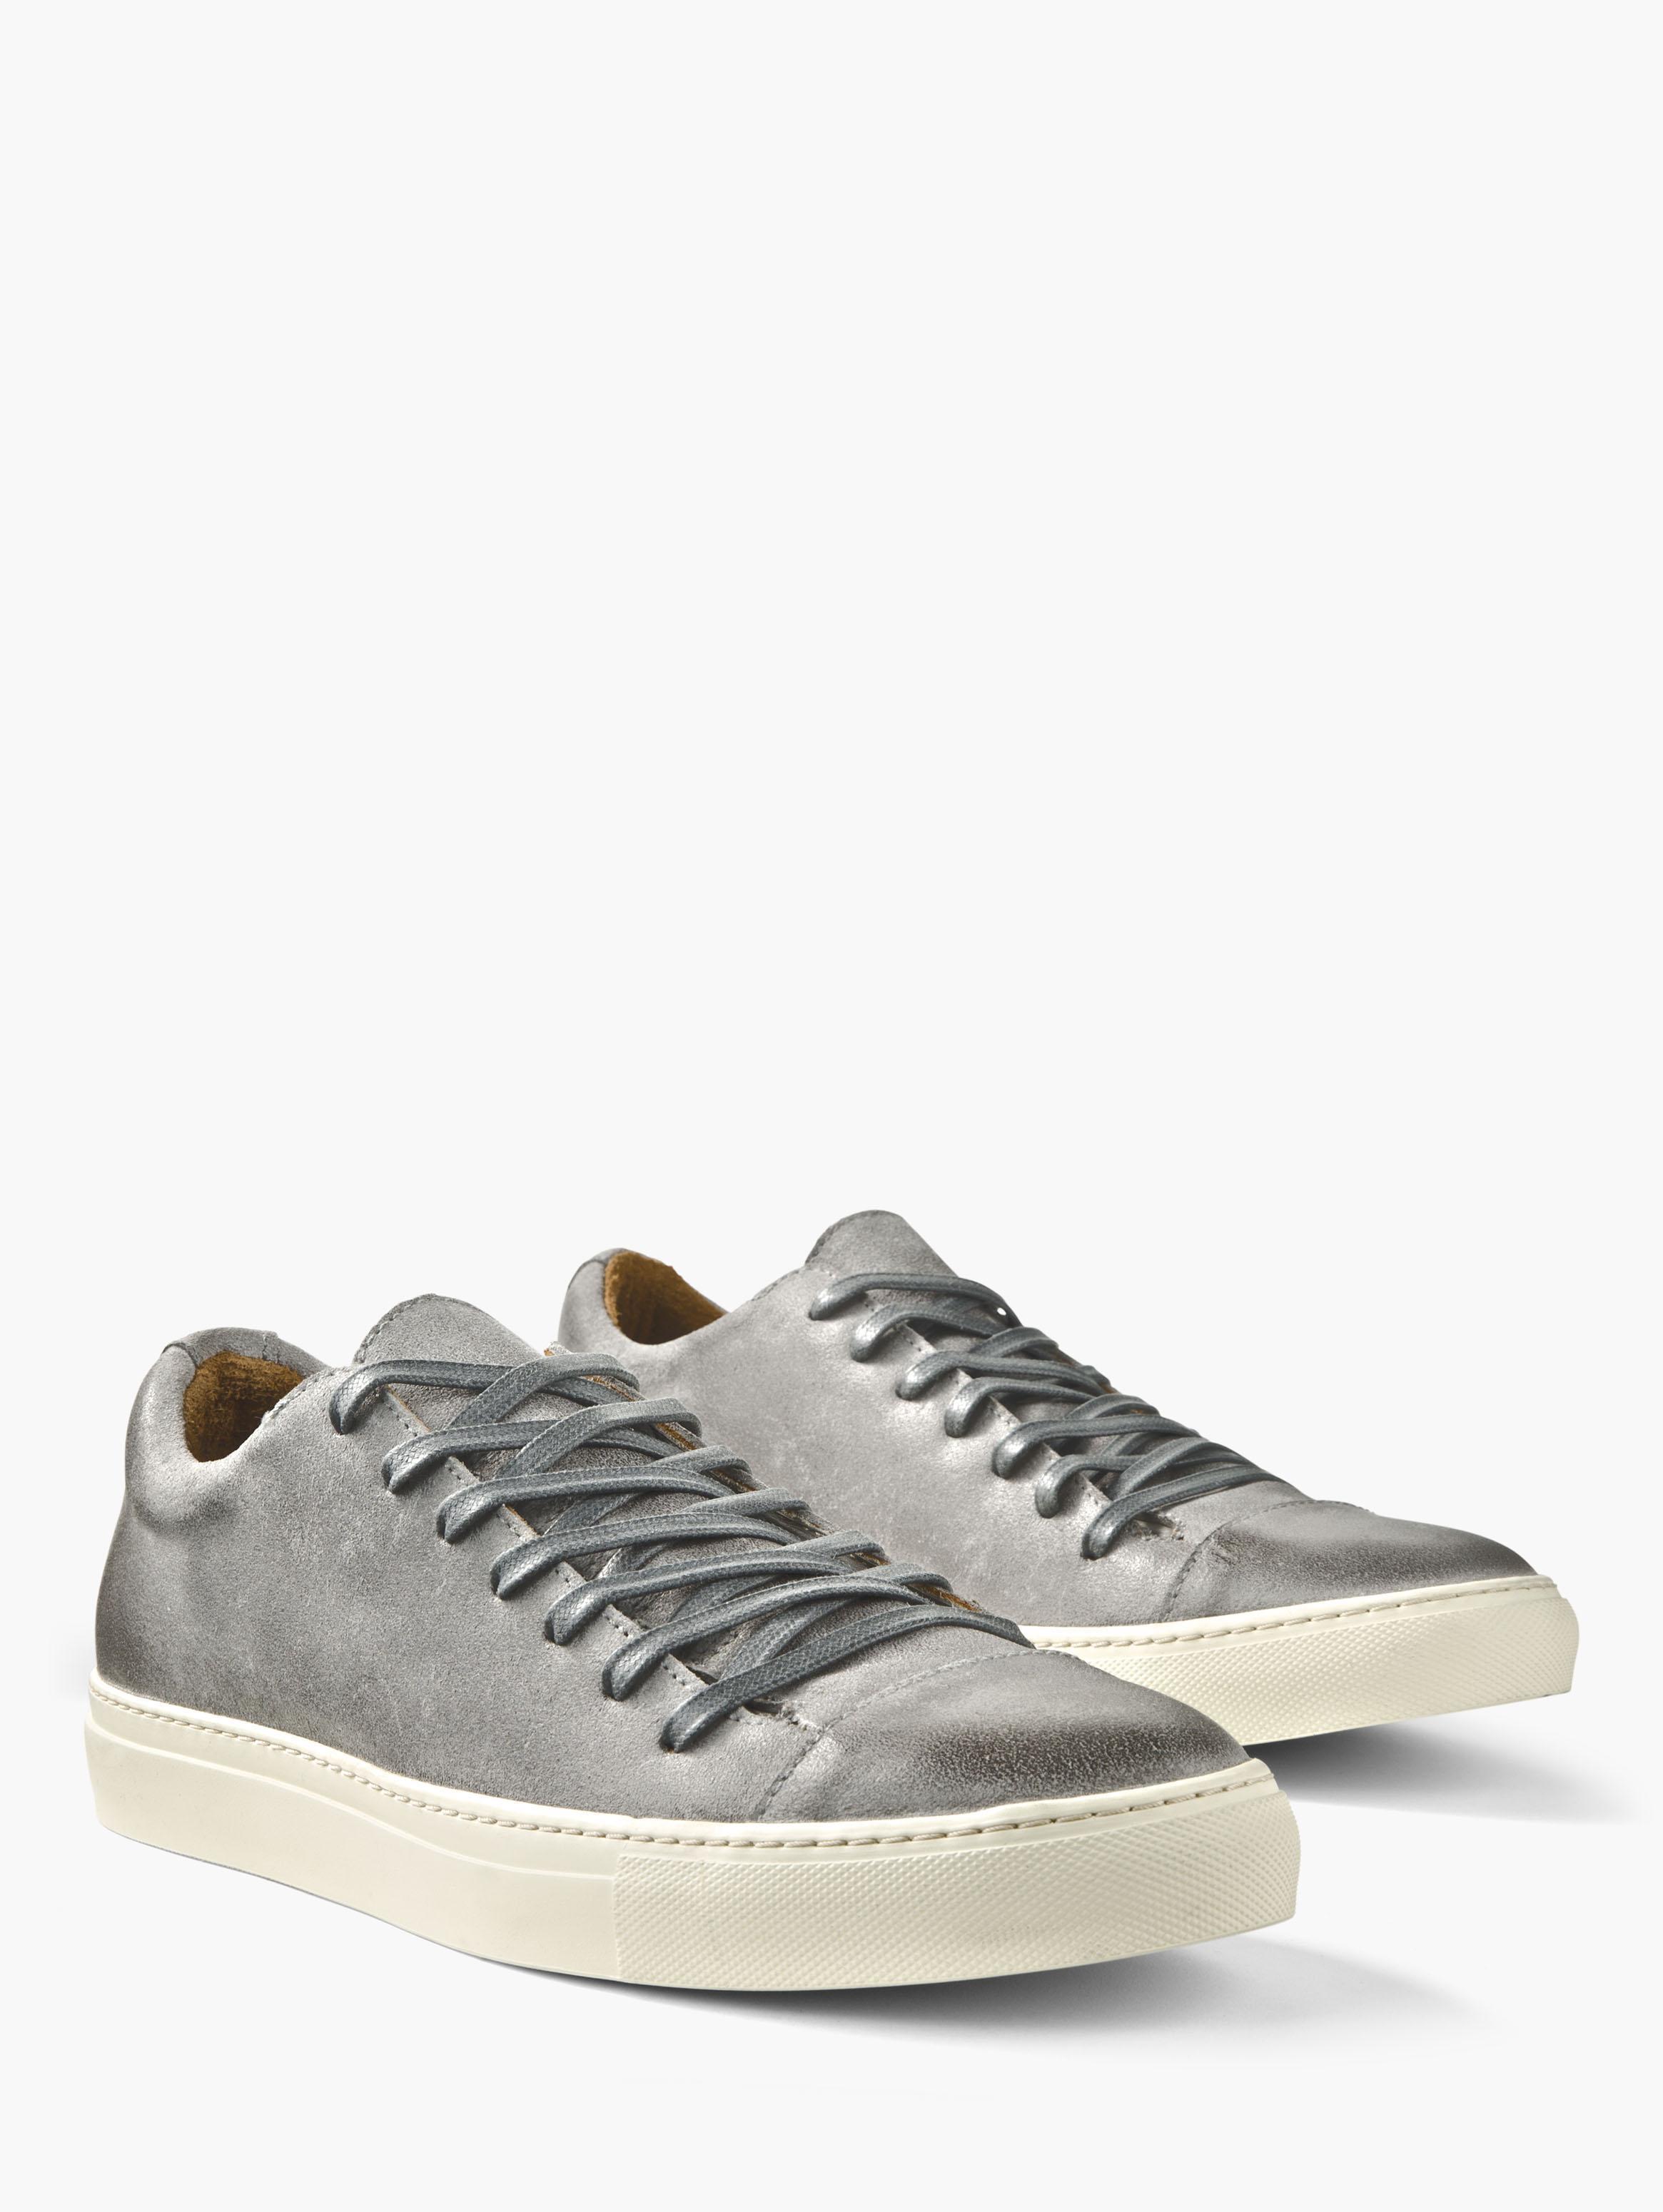 John Varvatos Reed Fringe Mid Top Sneaker Bone White Size: 11 2pNccEn8z